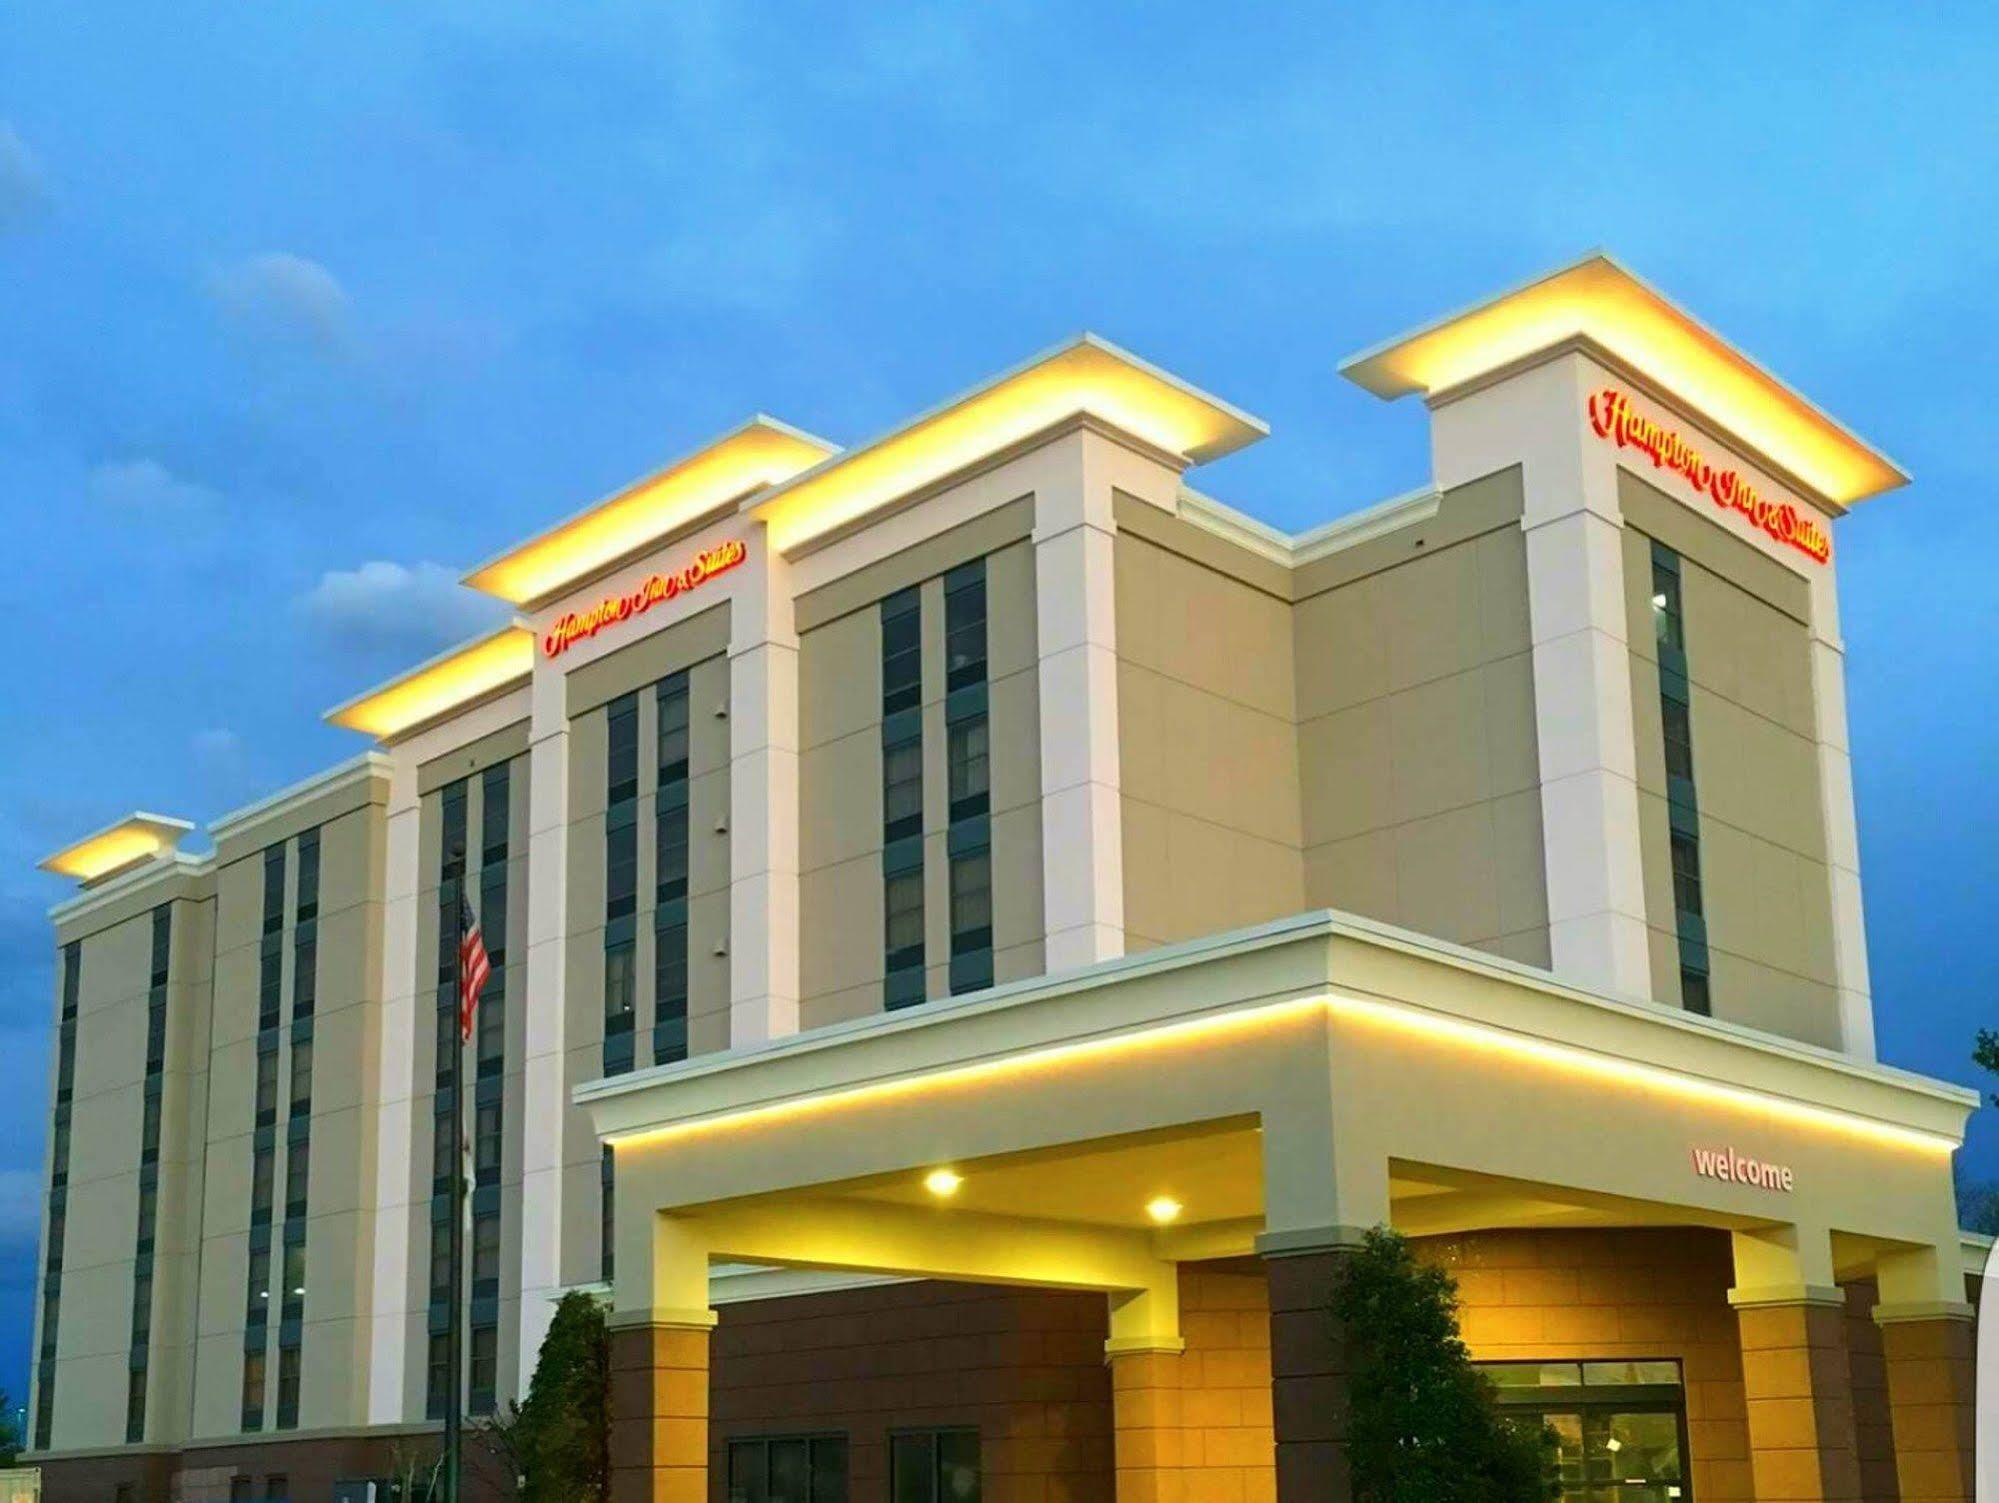 Hampton Inn & Suites Nashville Airport